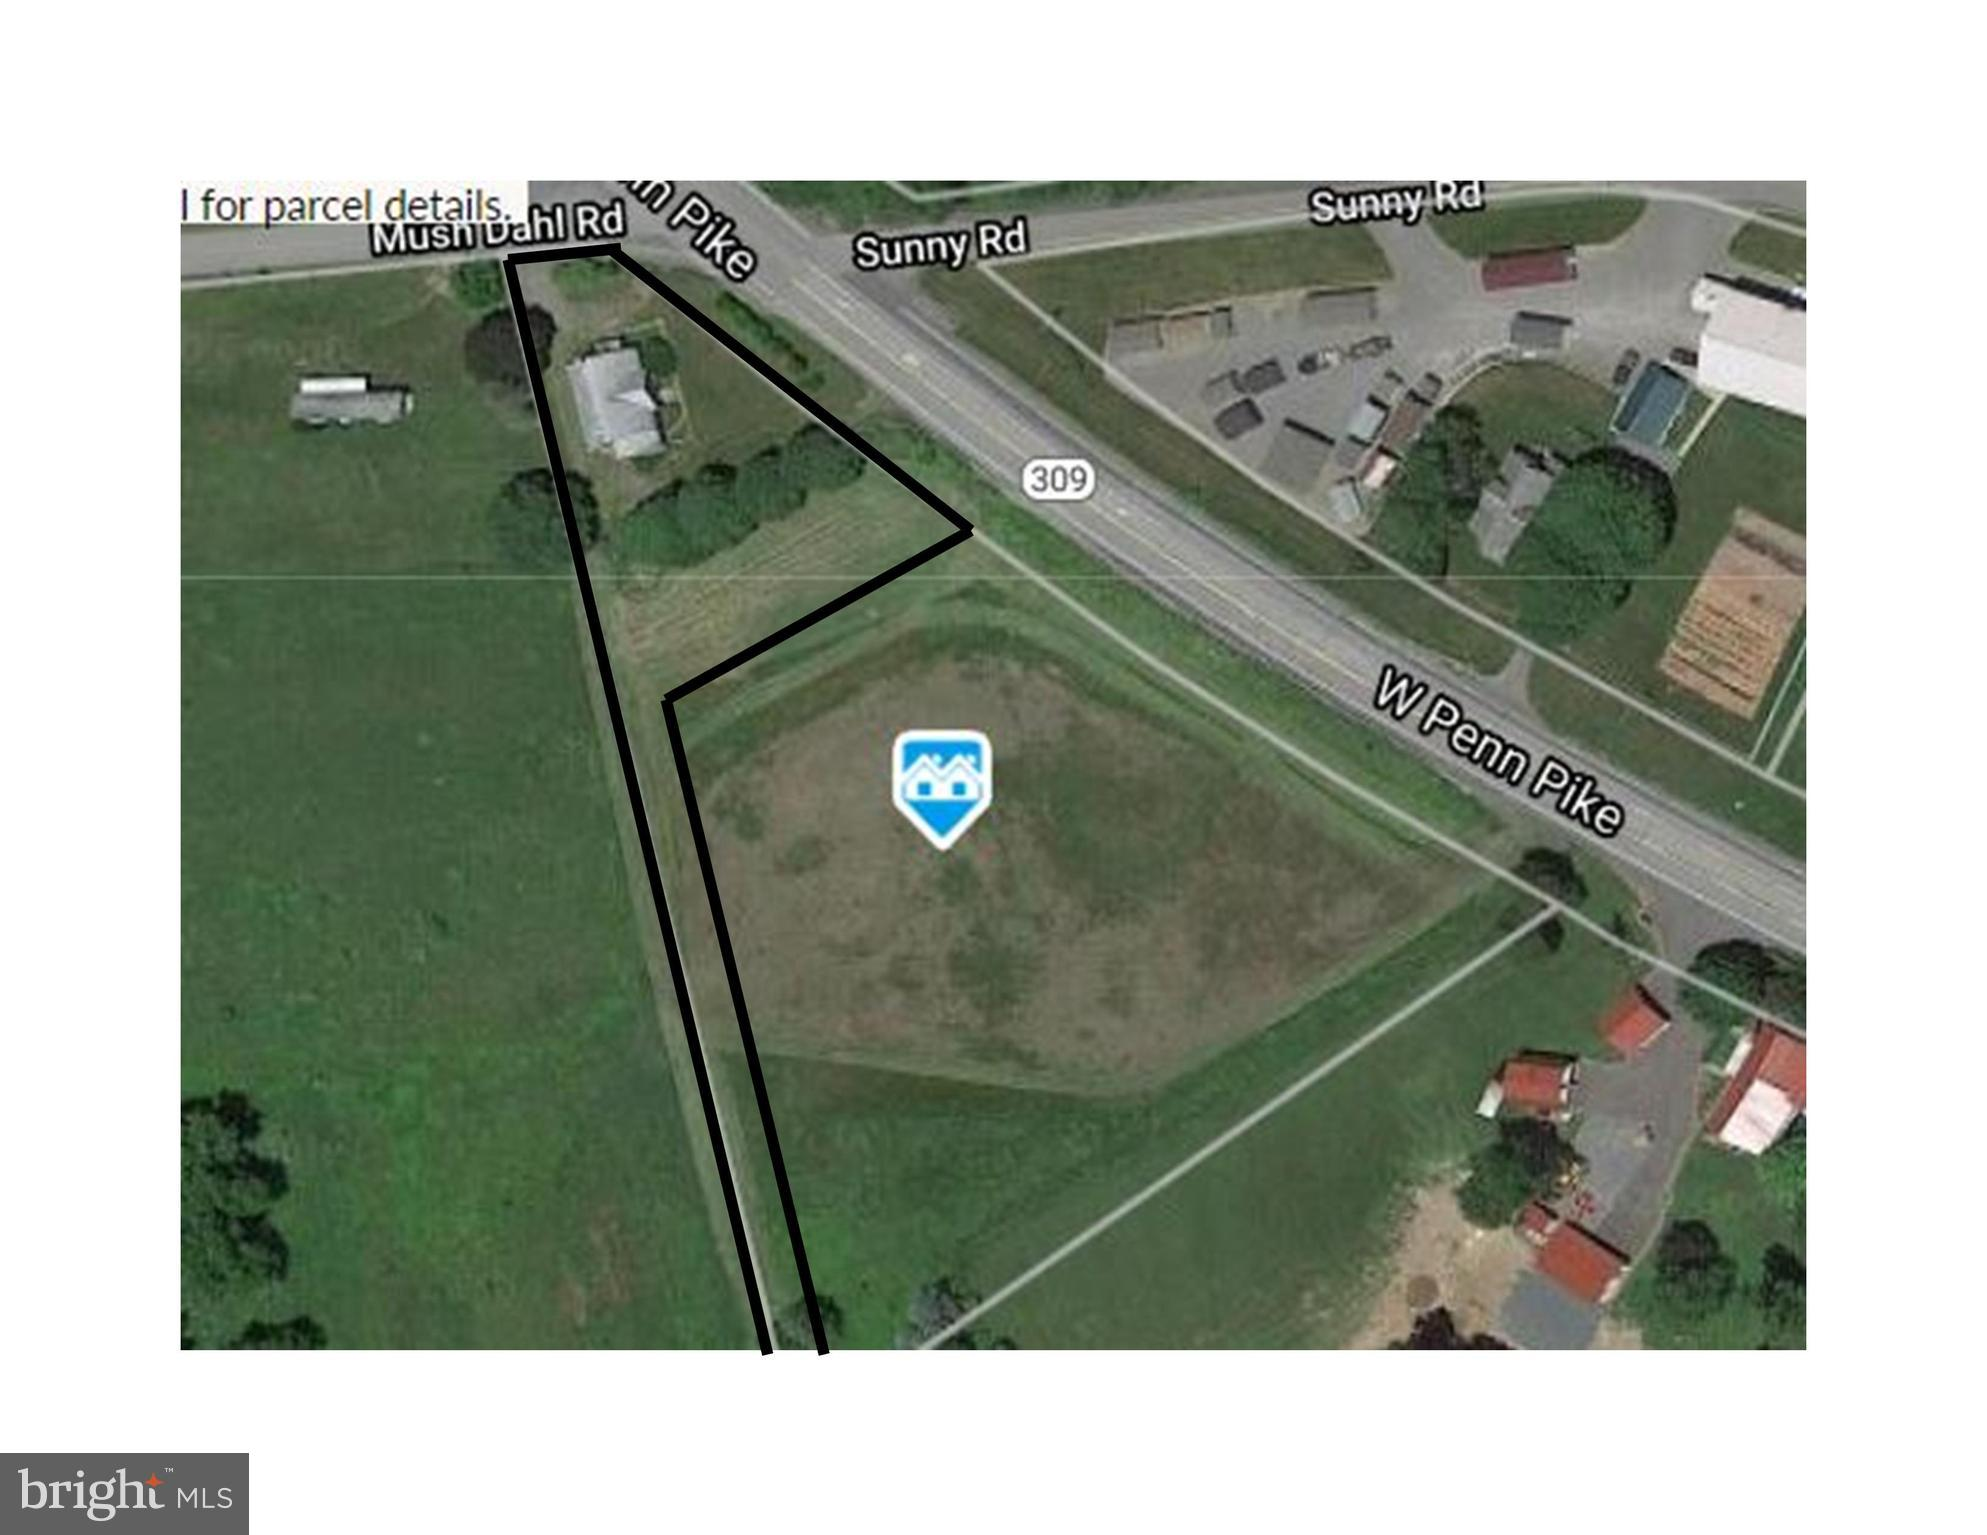 372 MUSH DAHL ROAD C, NEW RINGGOLD, PA 17960